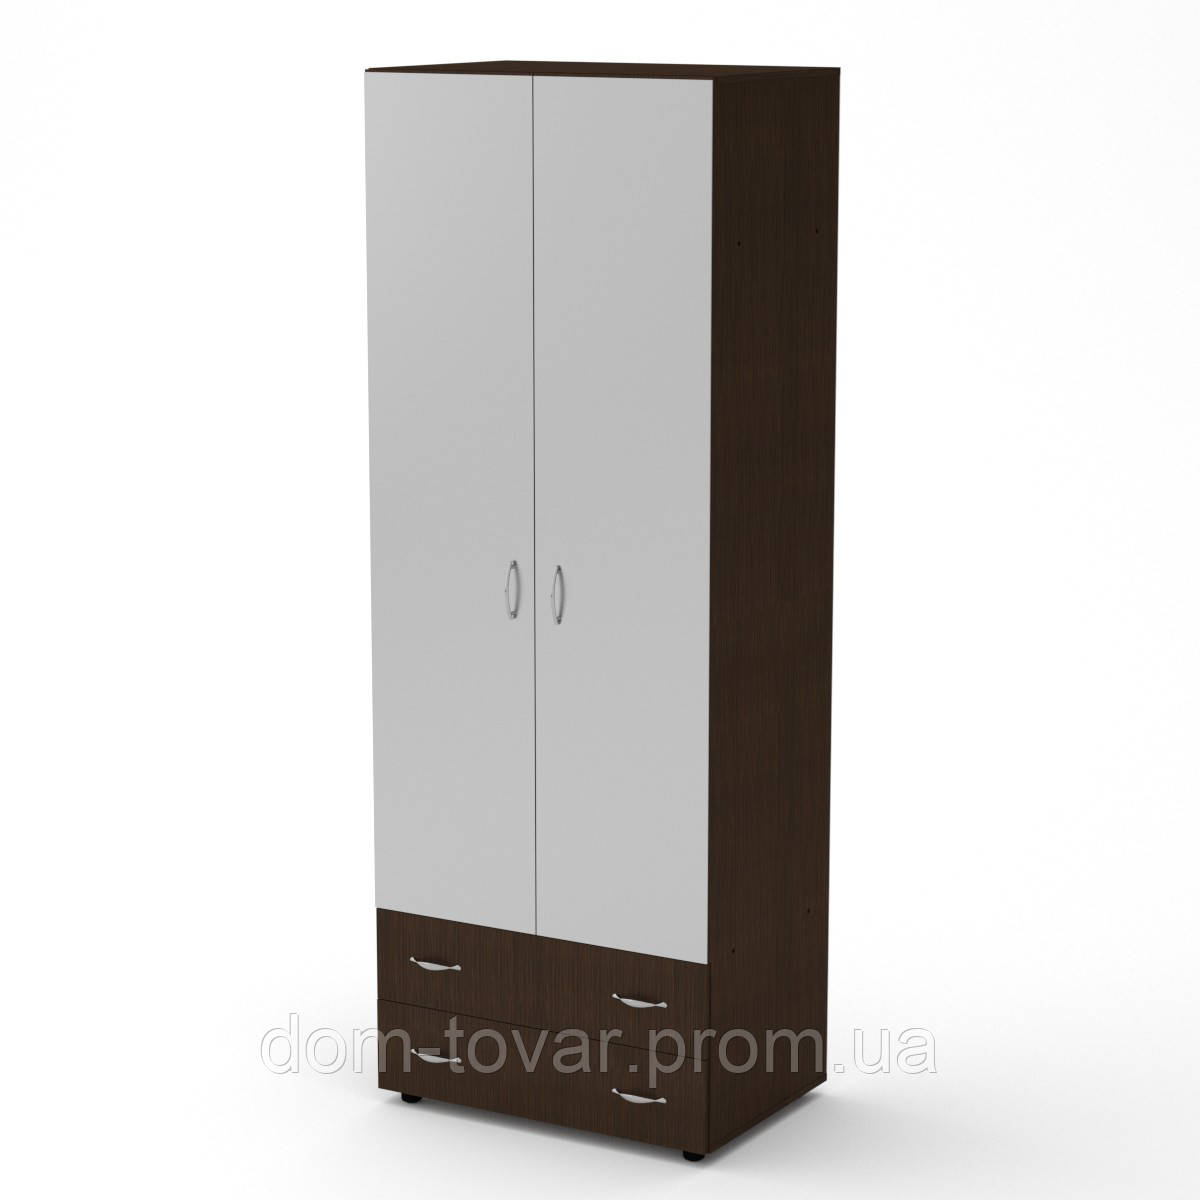 Шкаф -5 компанит